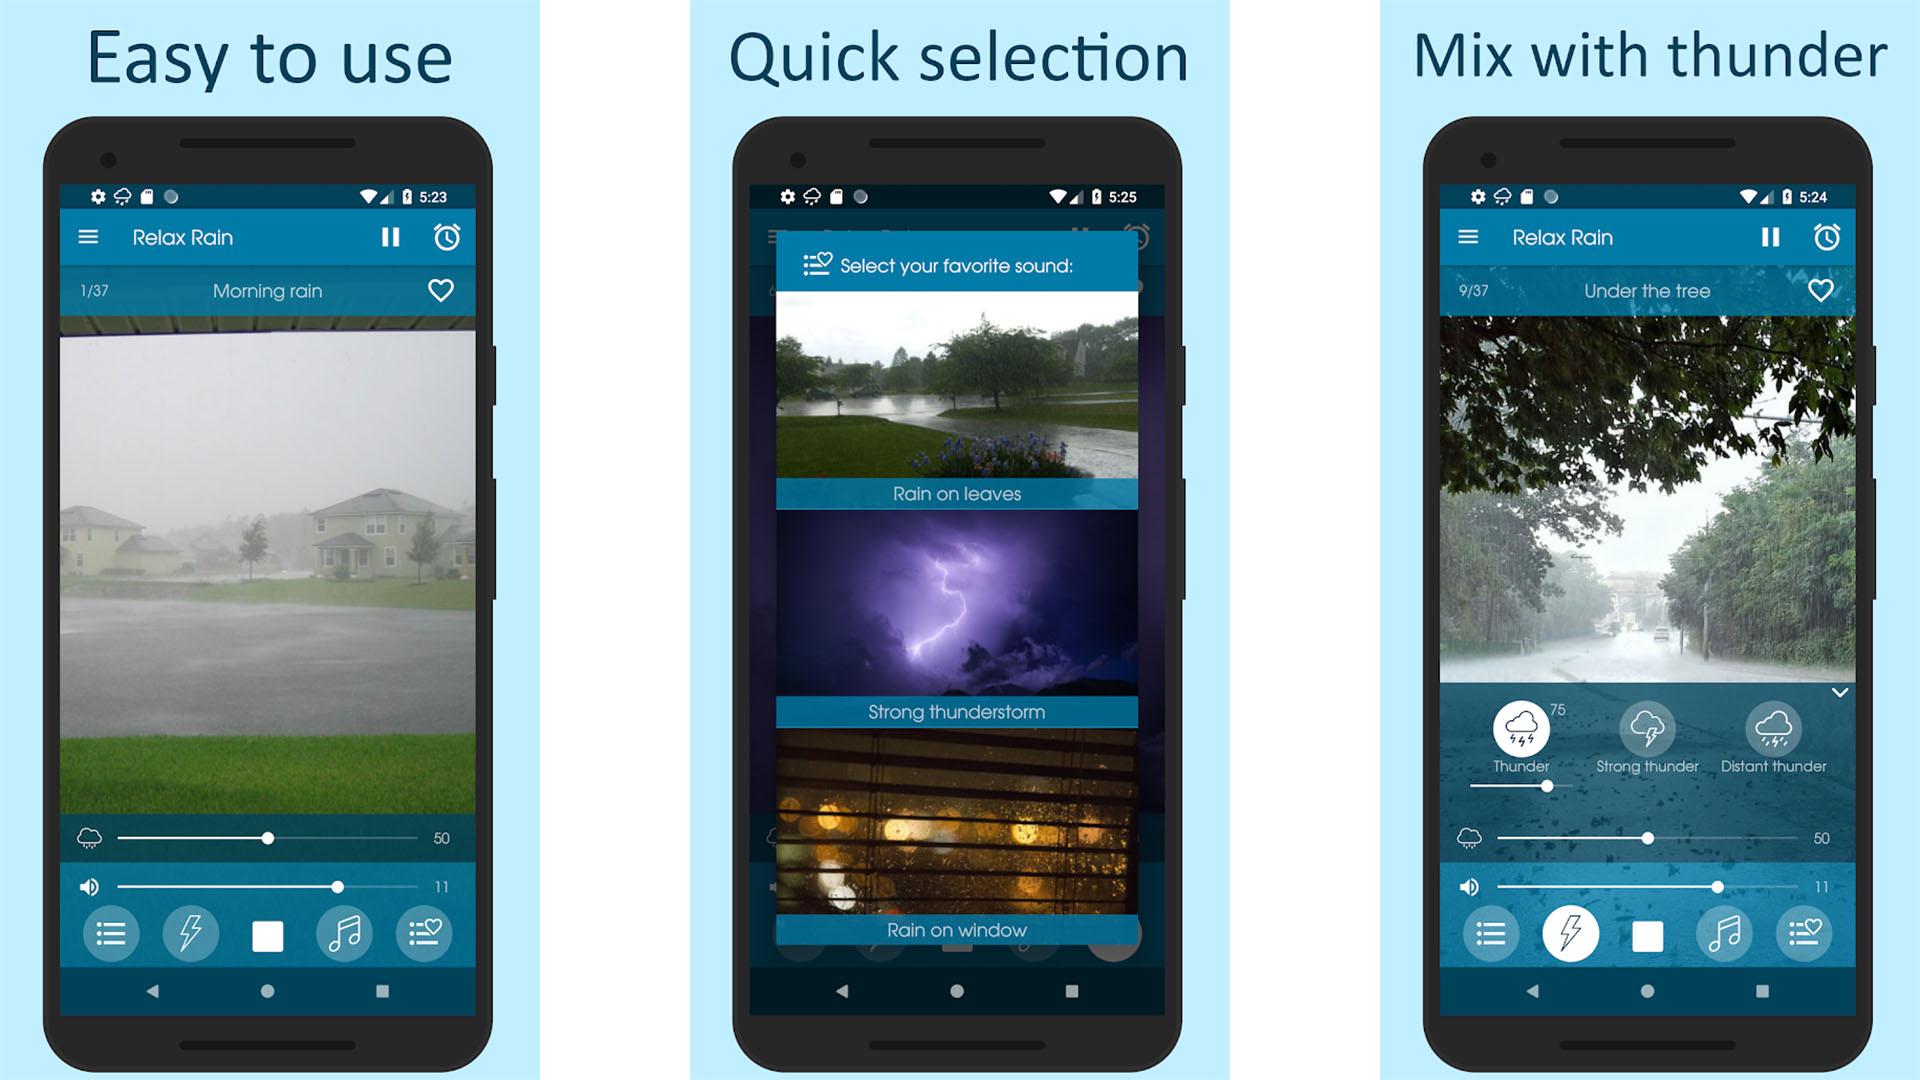 Mikdroid Relax Rain screenshot 2020